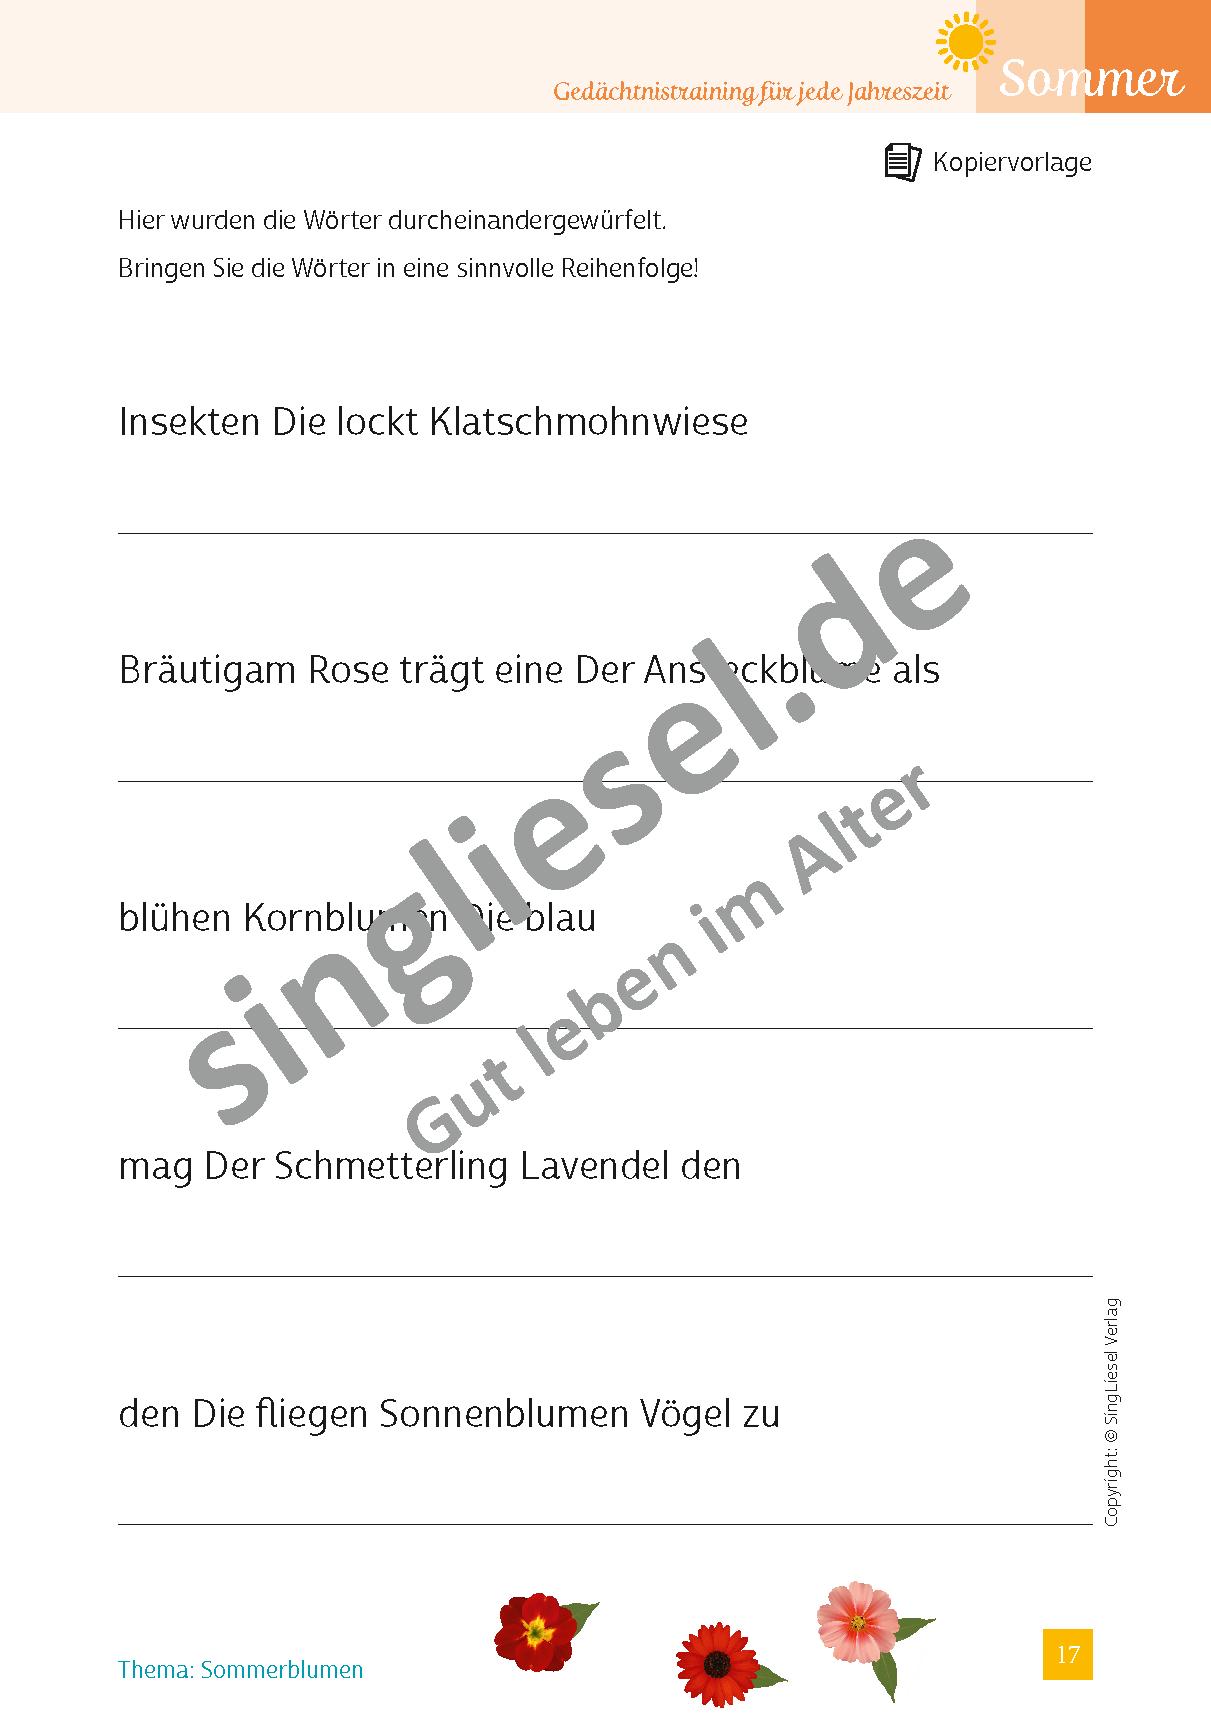 ESD-0001-037-001__Vorschau-17mDDzgjZ9pHue4